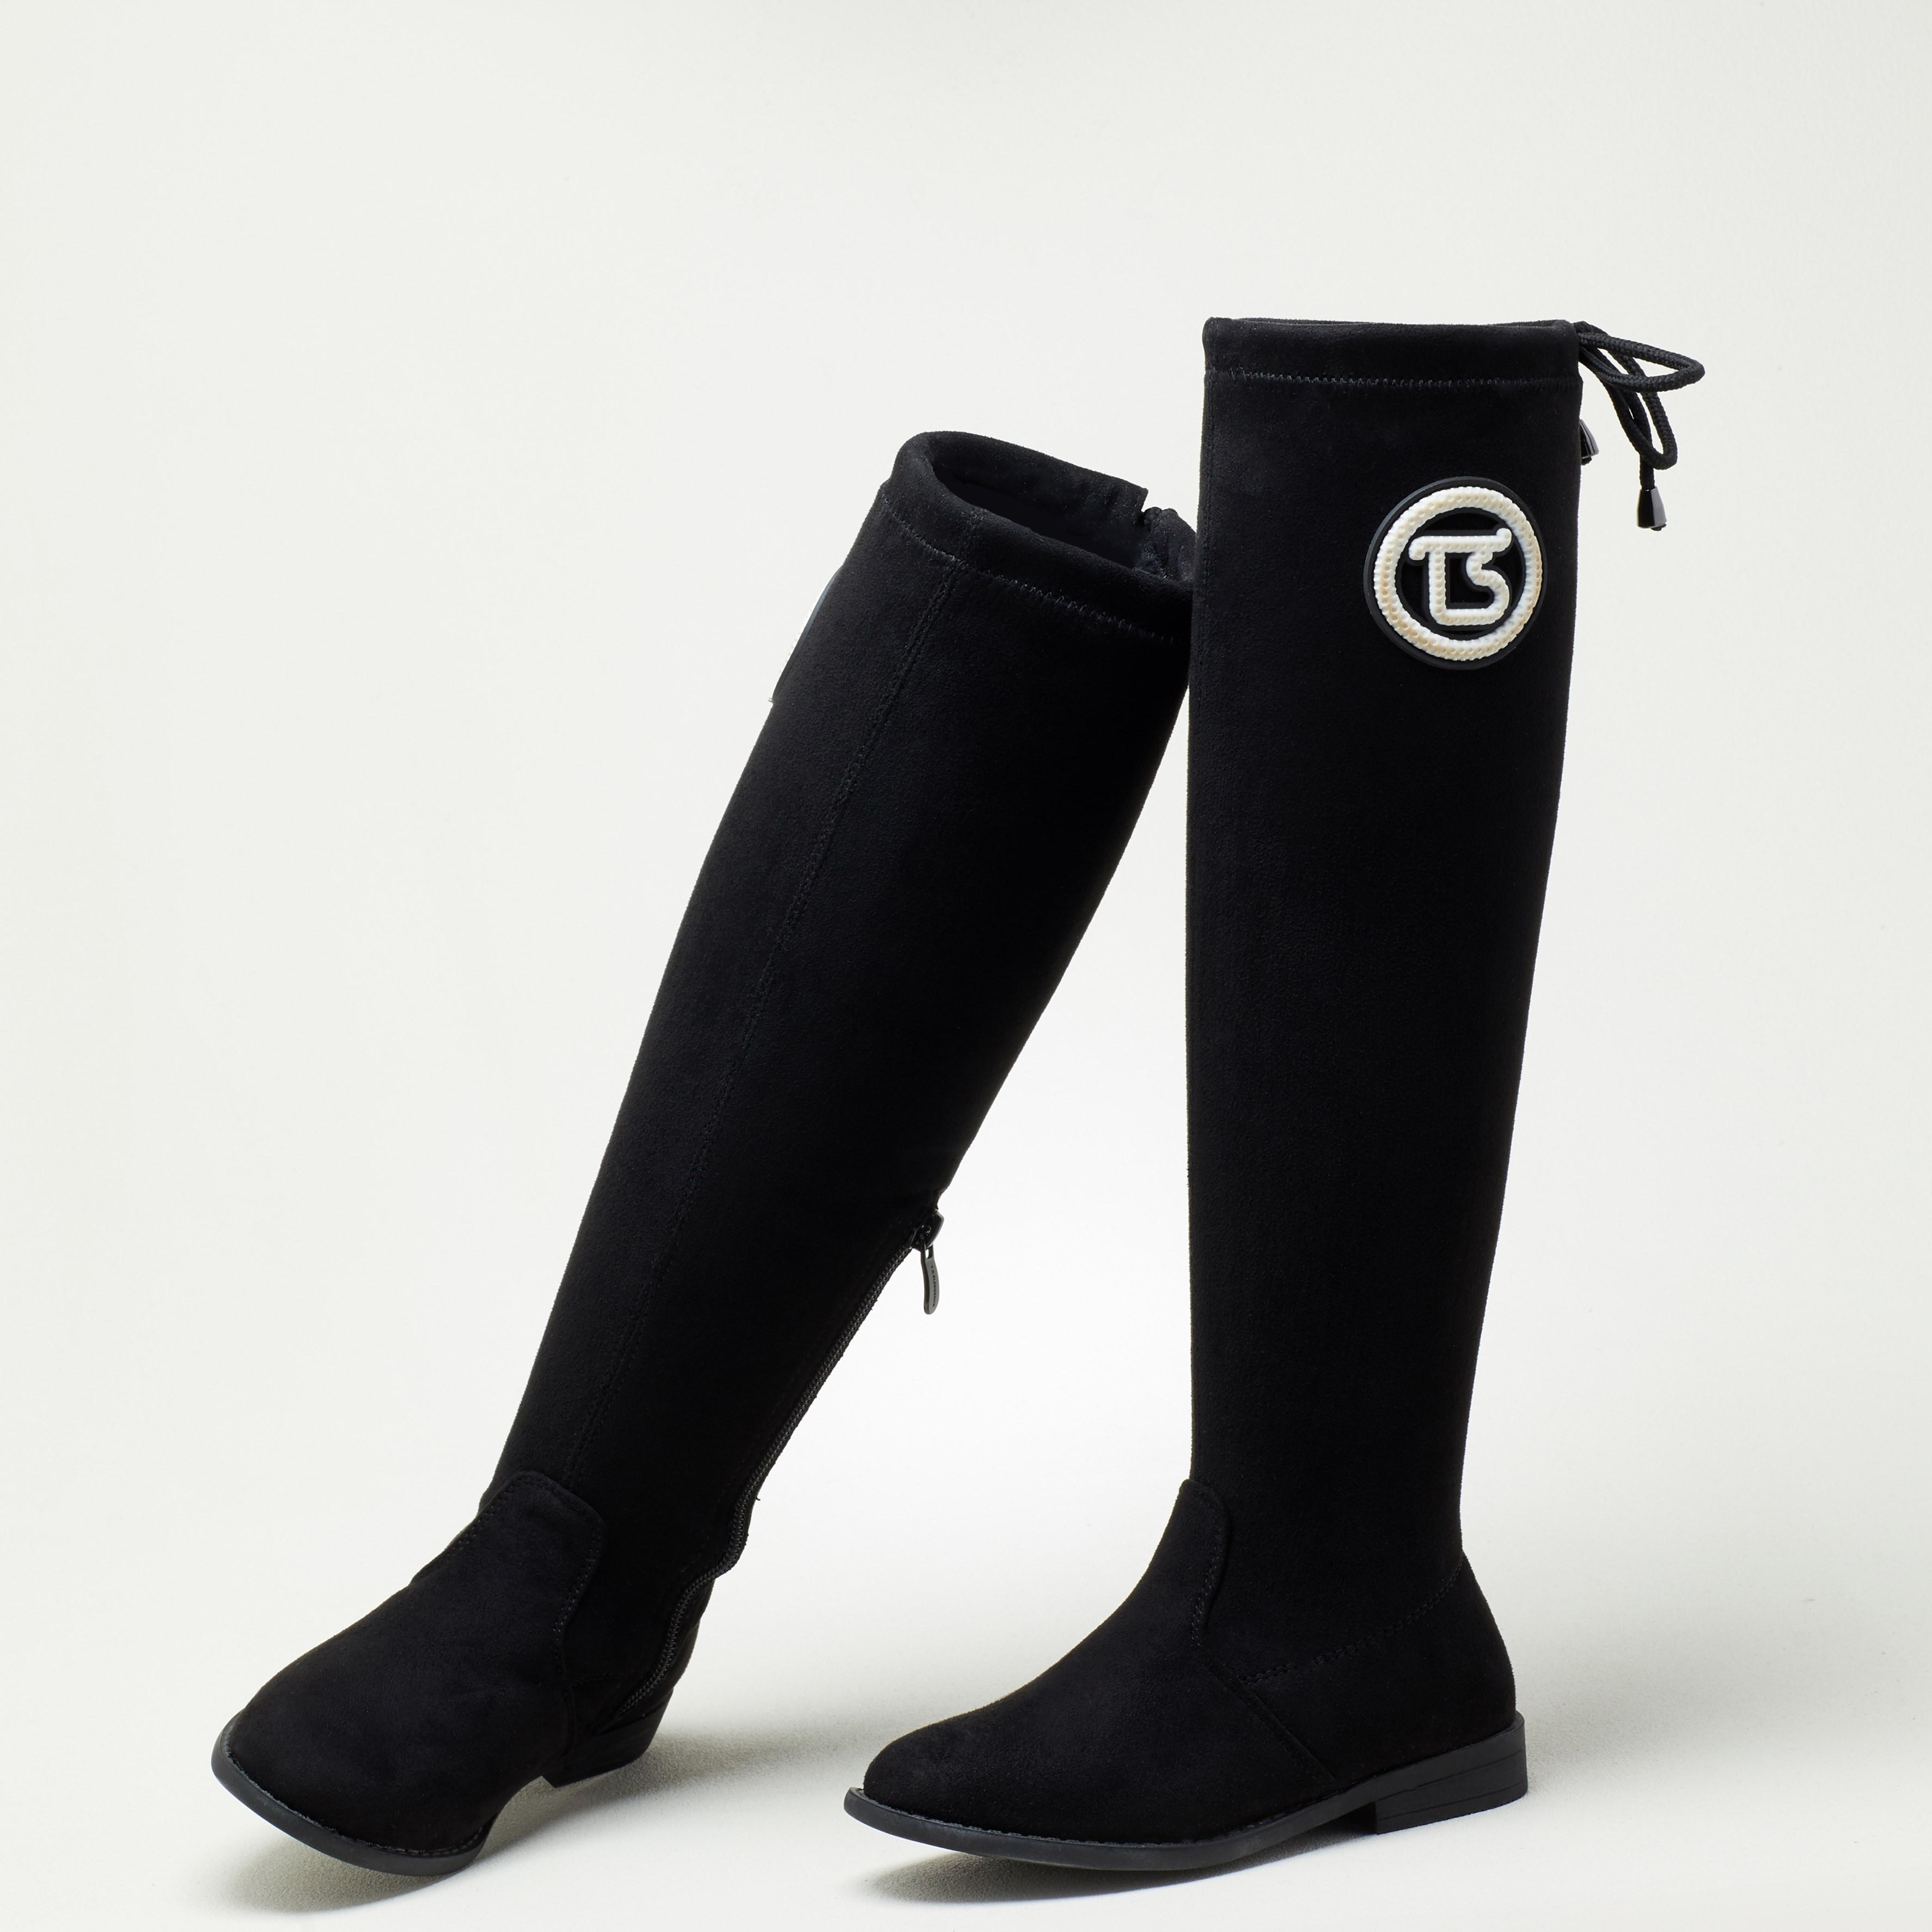 b7606baa641e2 مصادر شركات تصنيع المرأة حذاء مسطح طويل والمرأة حذاء مسطح طويل في  Alibaba.com